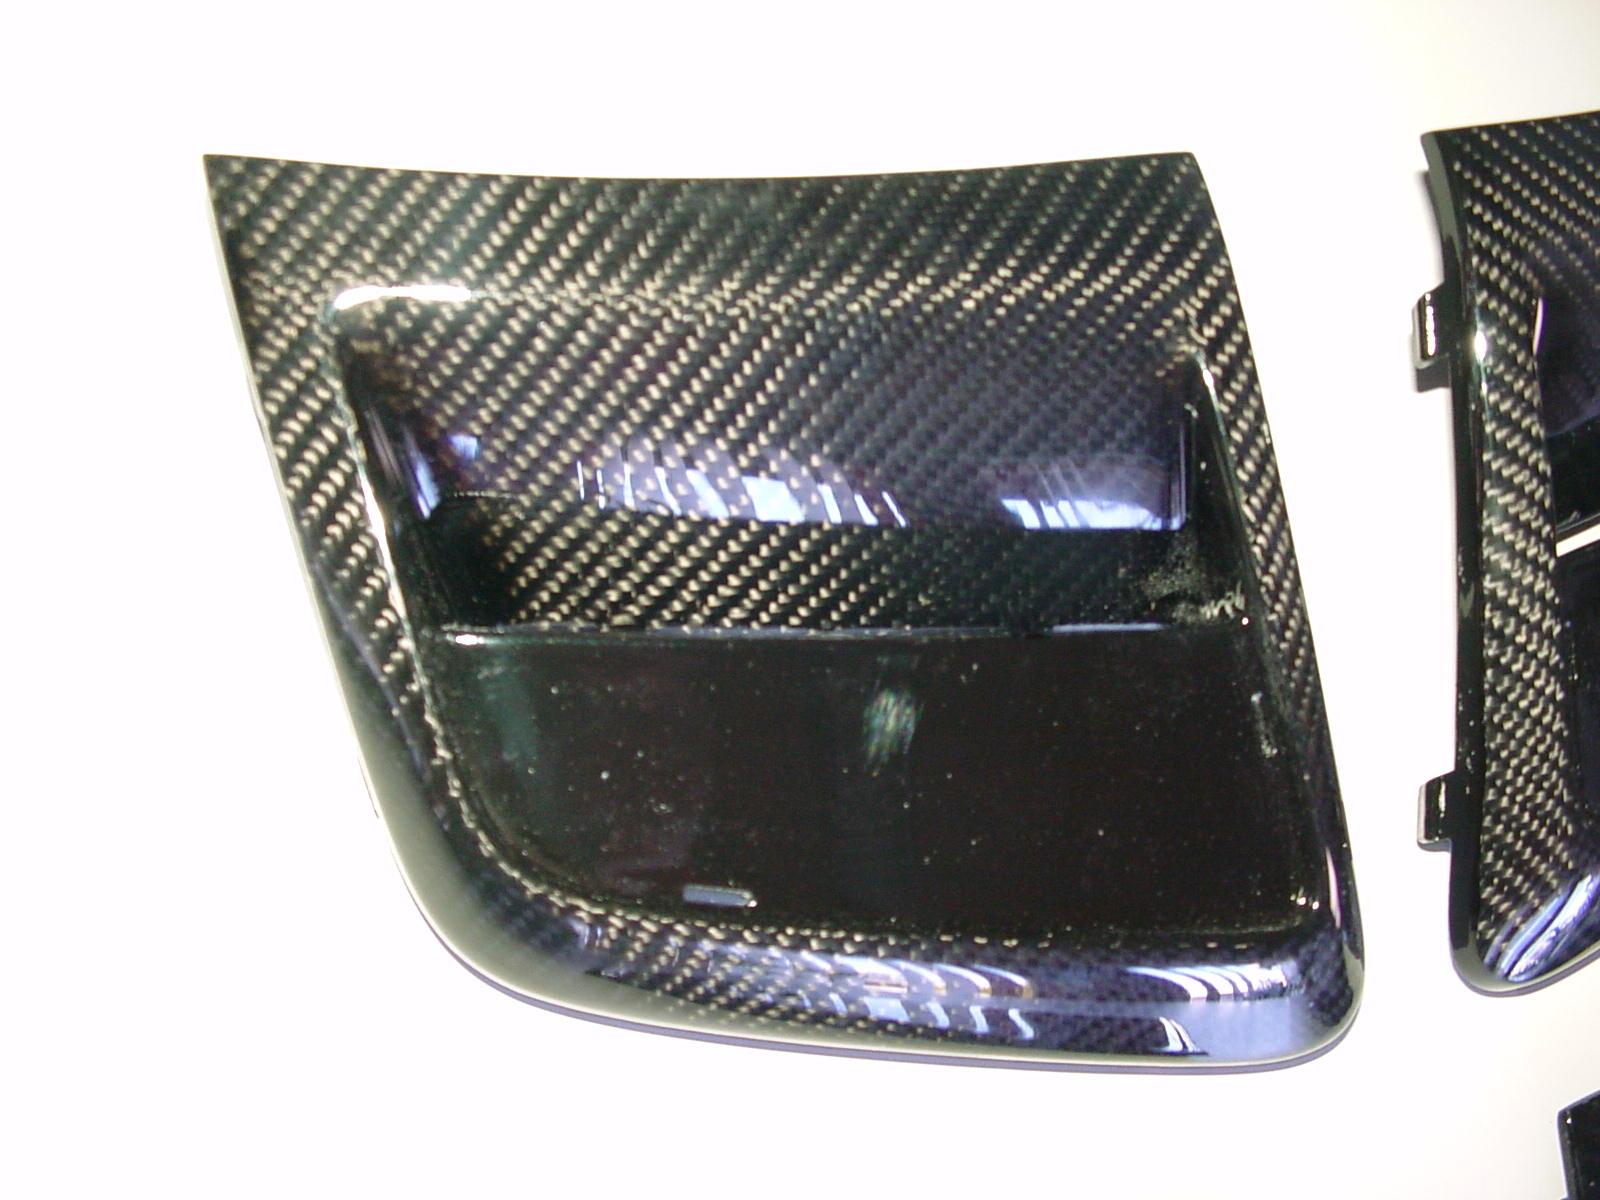 SLK R171 AMG55 Luftschachtblenden AMG Stoßstange Göckel Automobilveredelung Styling Tuning Mercedes Benz